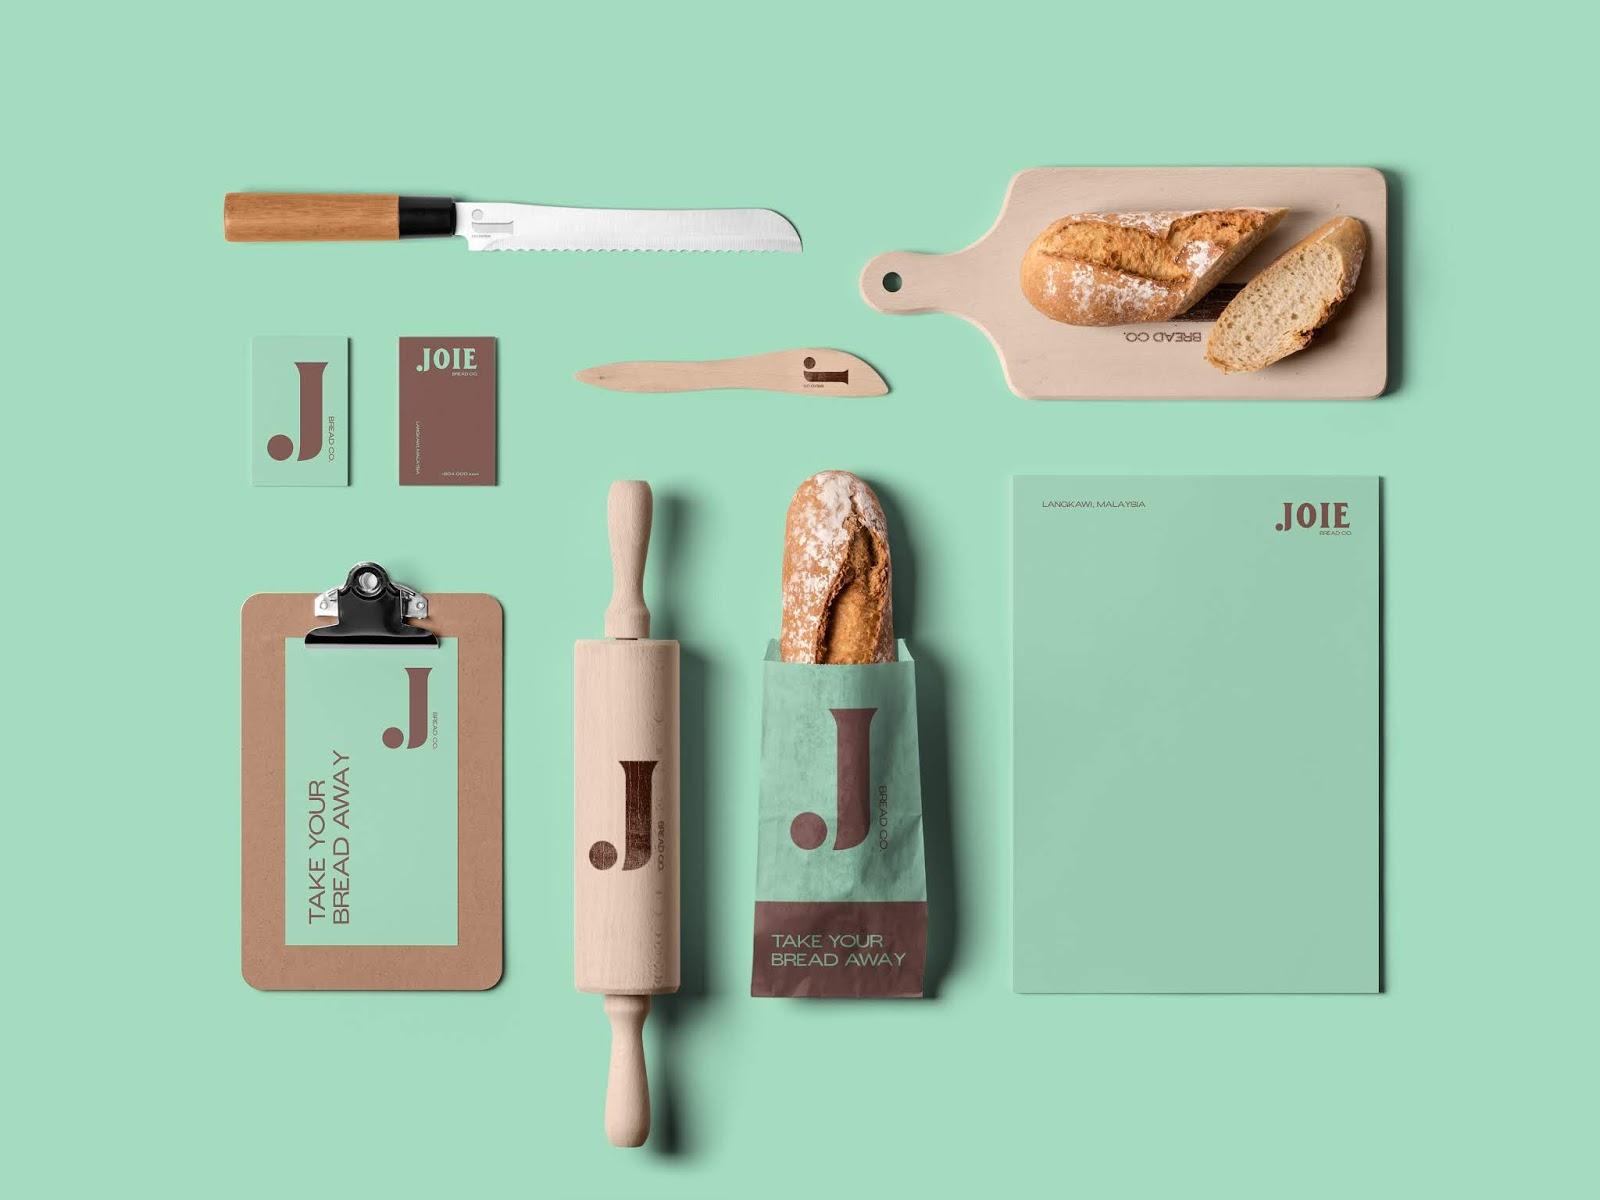 Joie-店铺策划